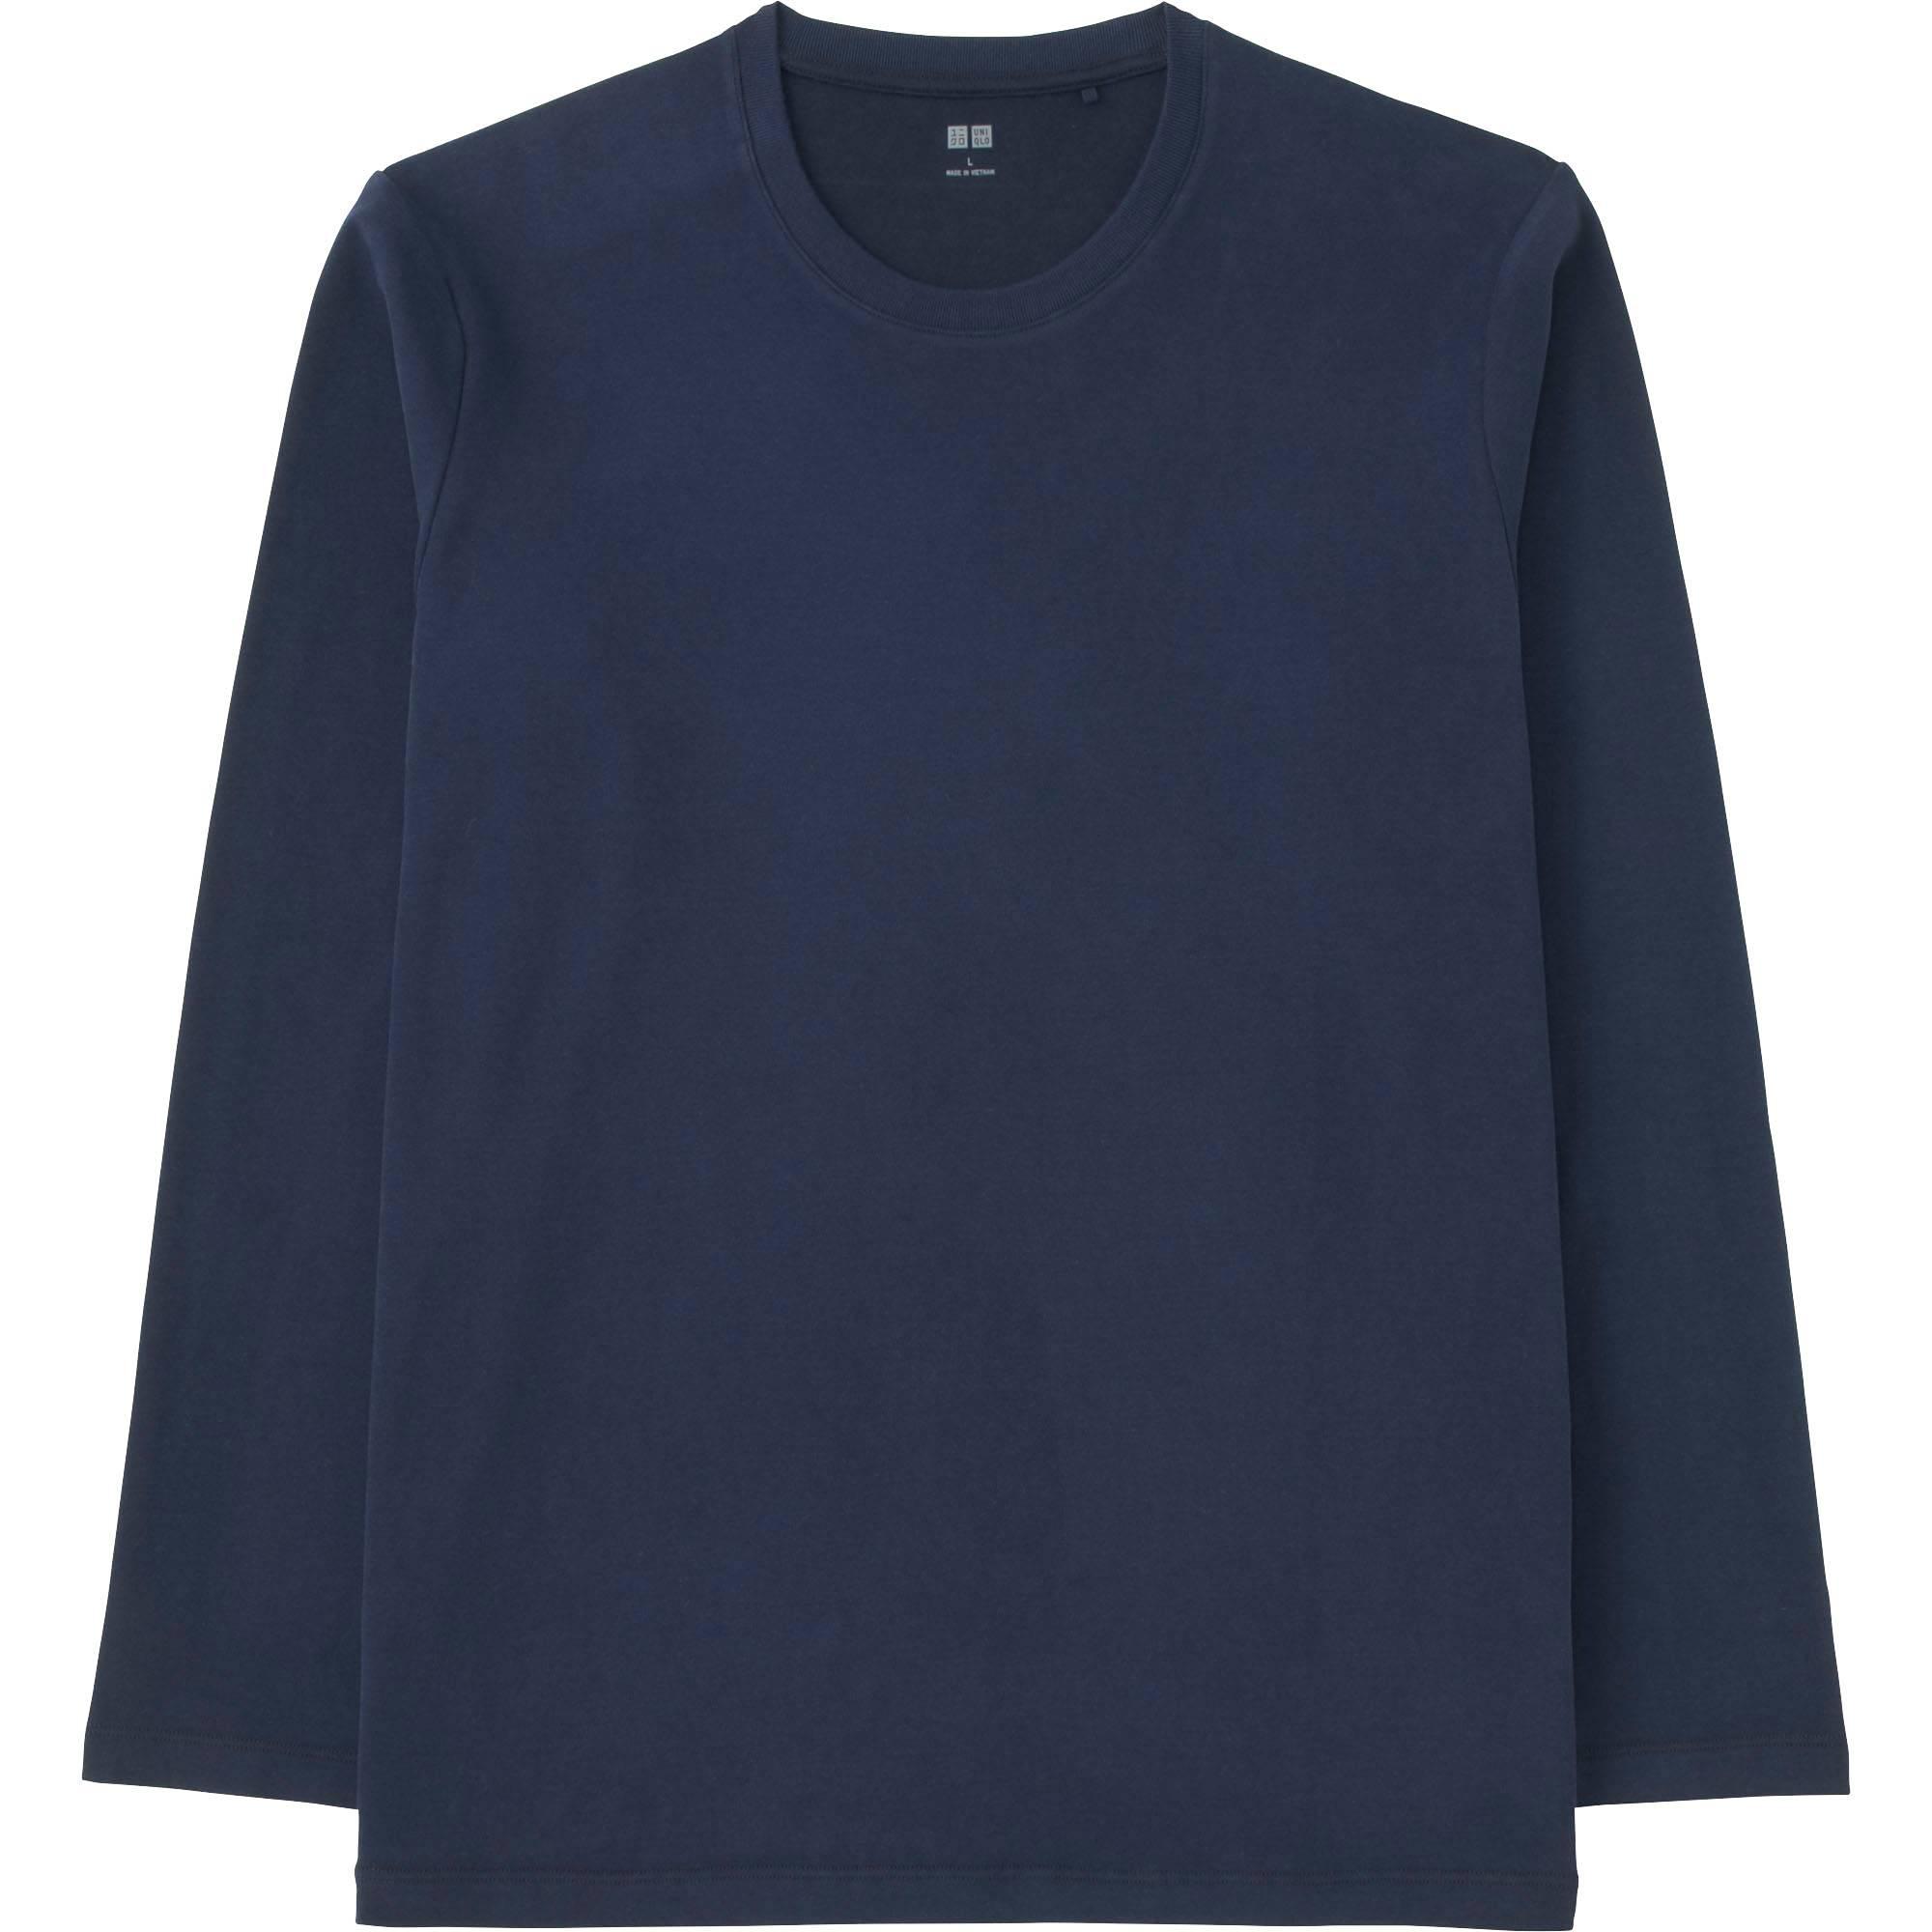 Black Long Sleeve Shirt Men